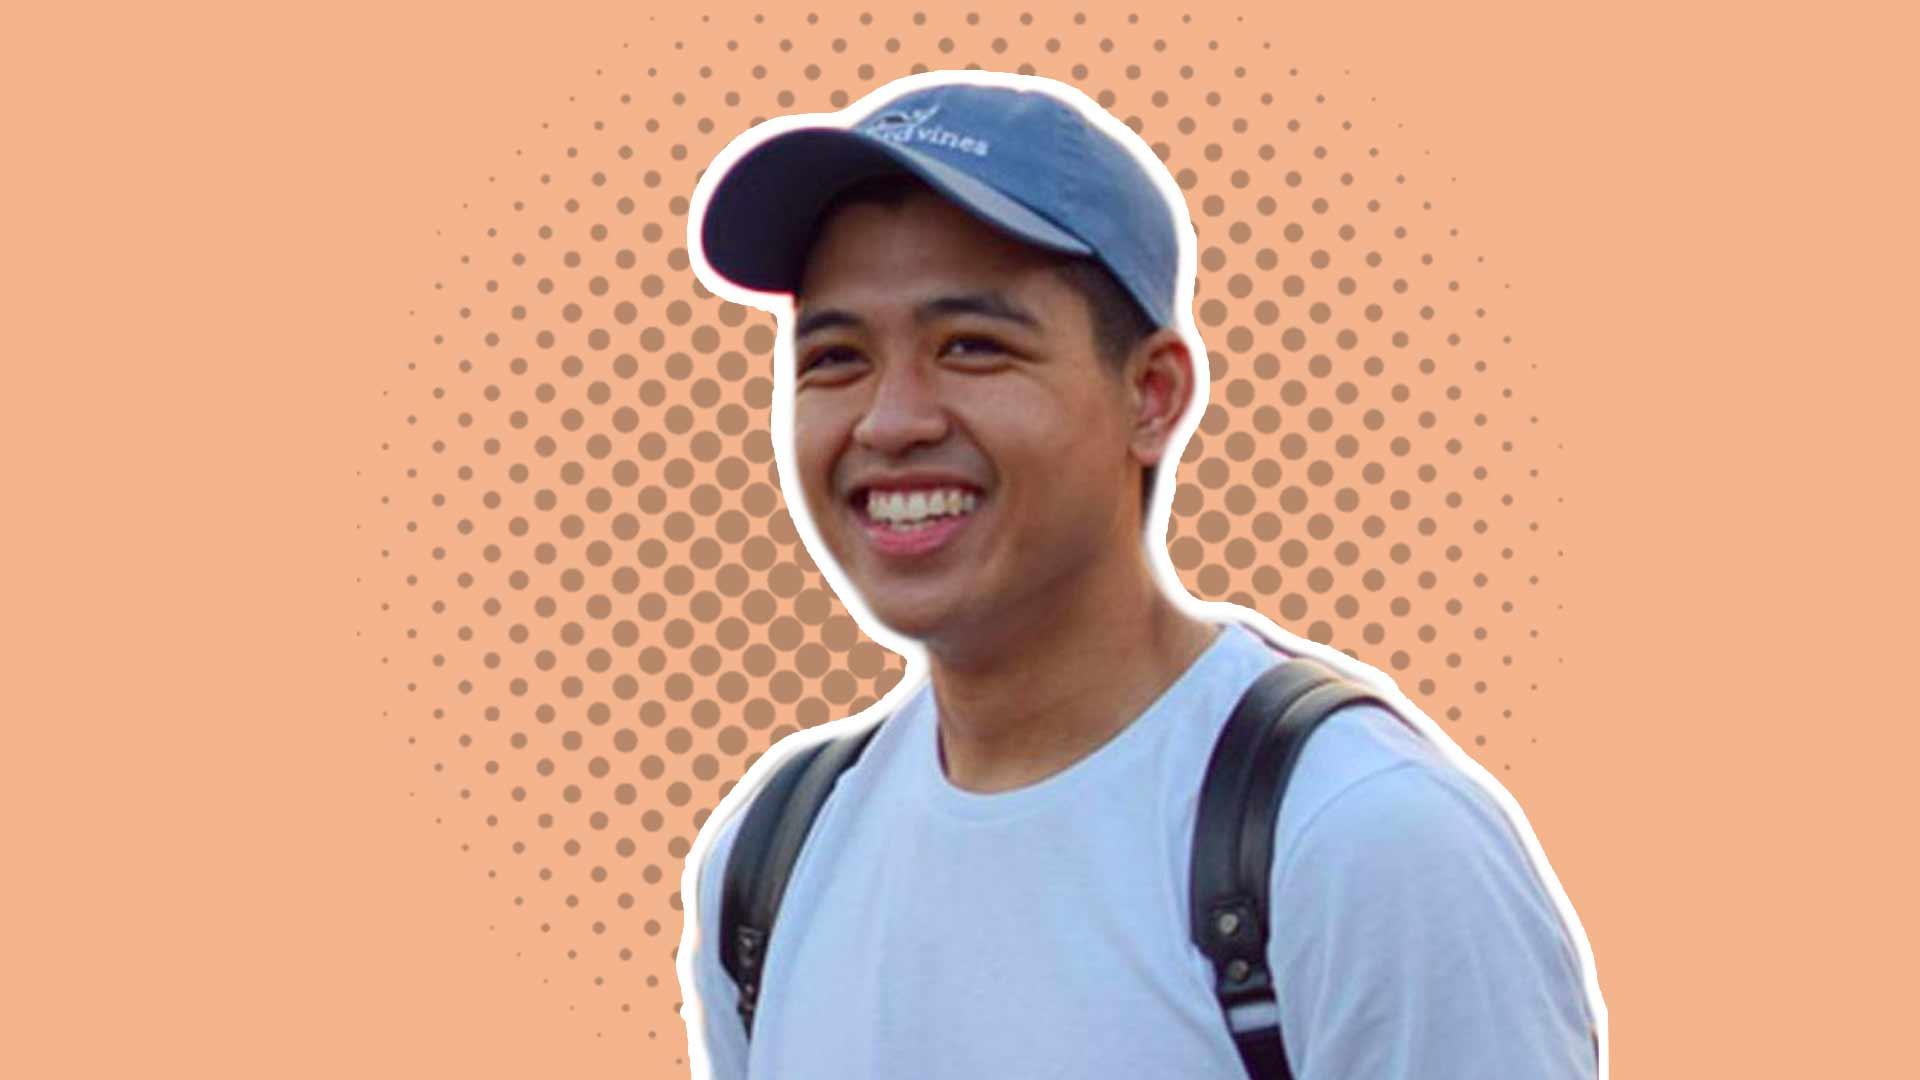 Erik Hernal, From Student to Hiring Partner – An Accelerator Case Study